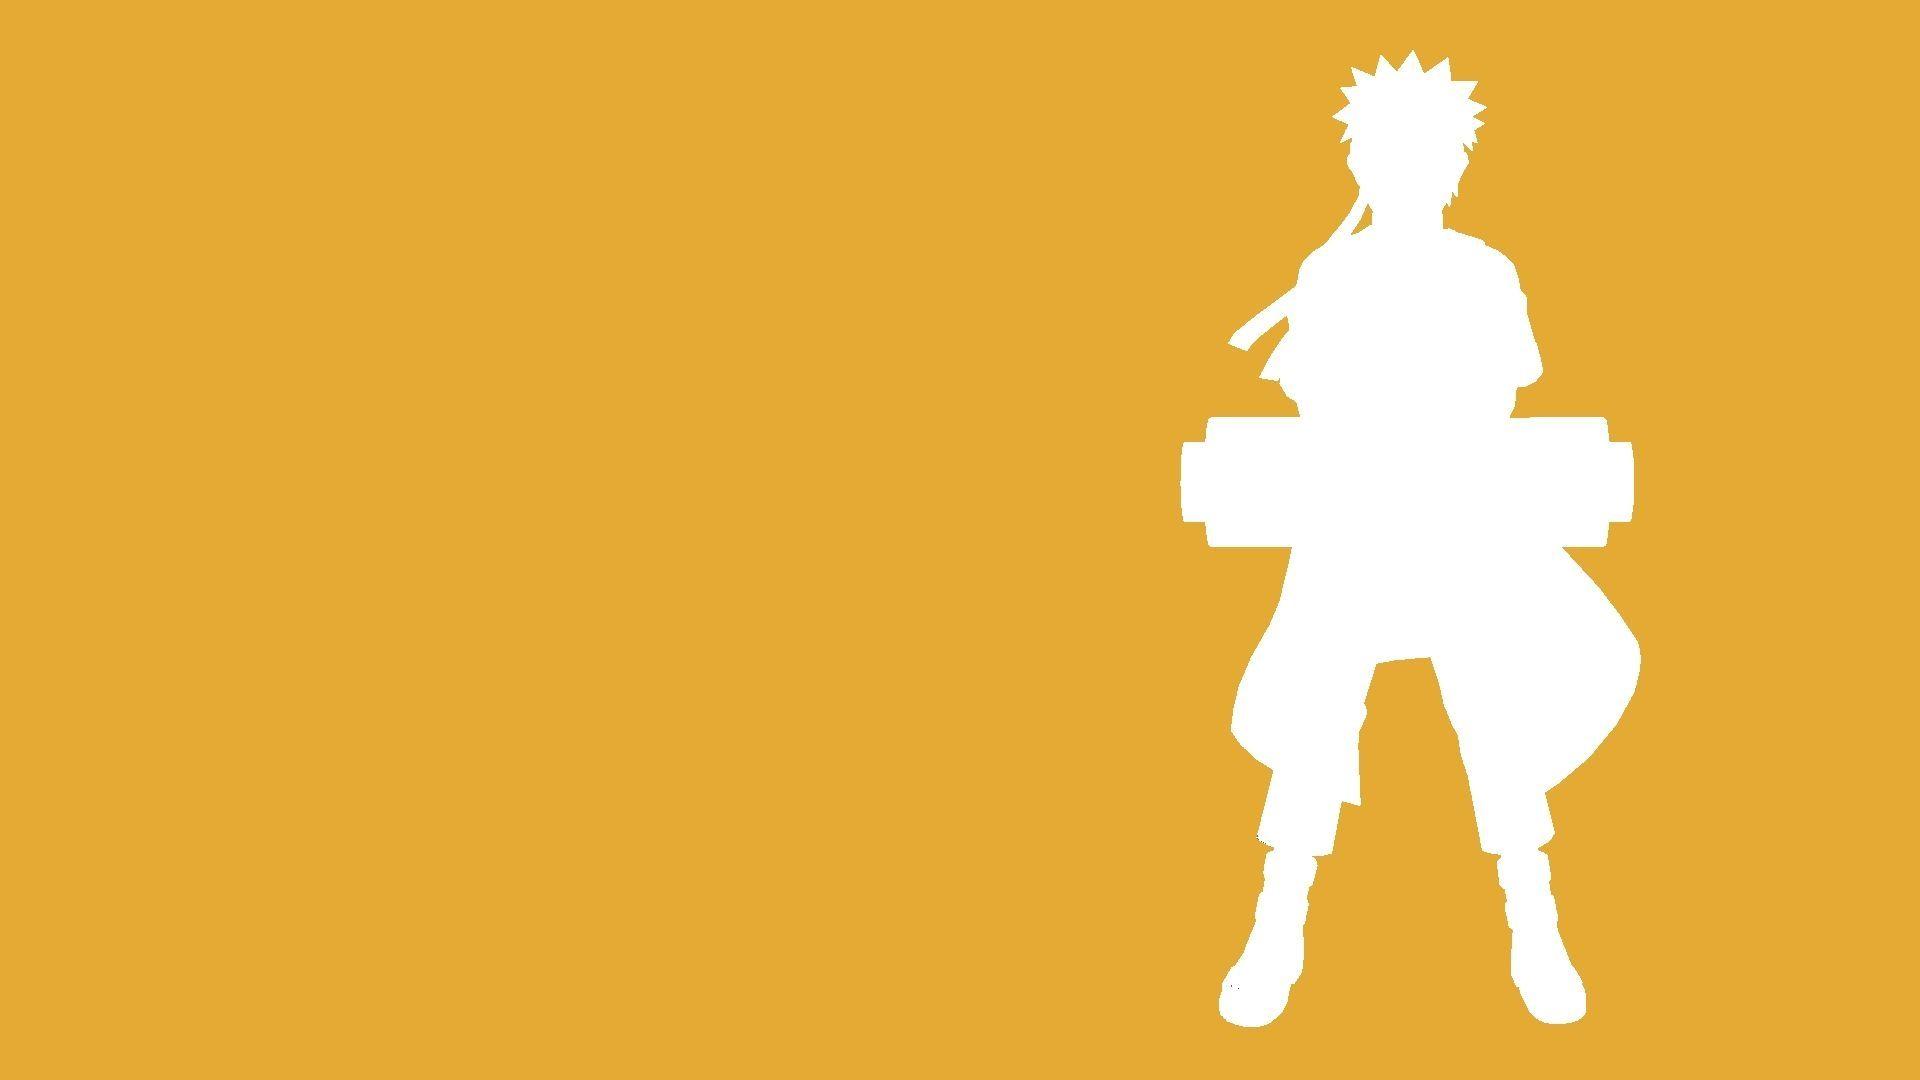 Naruto Minimalist, Good Wallpaper